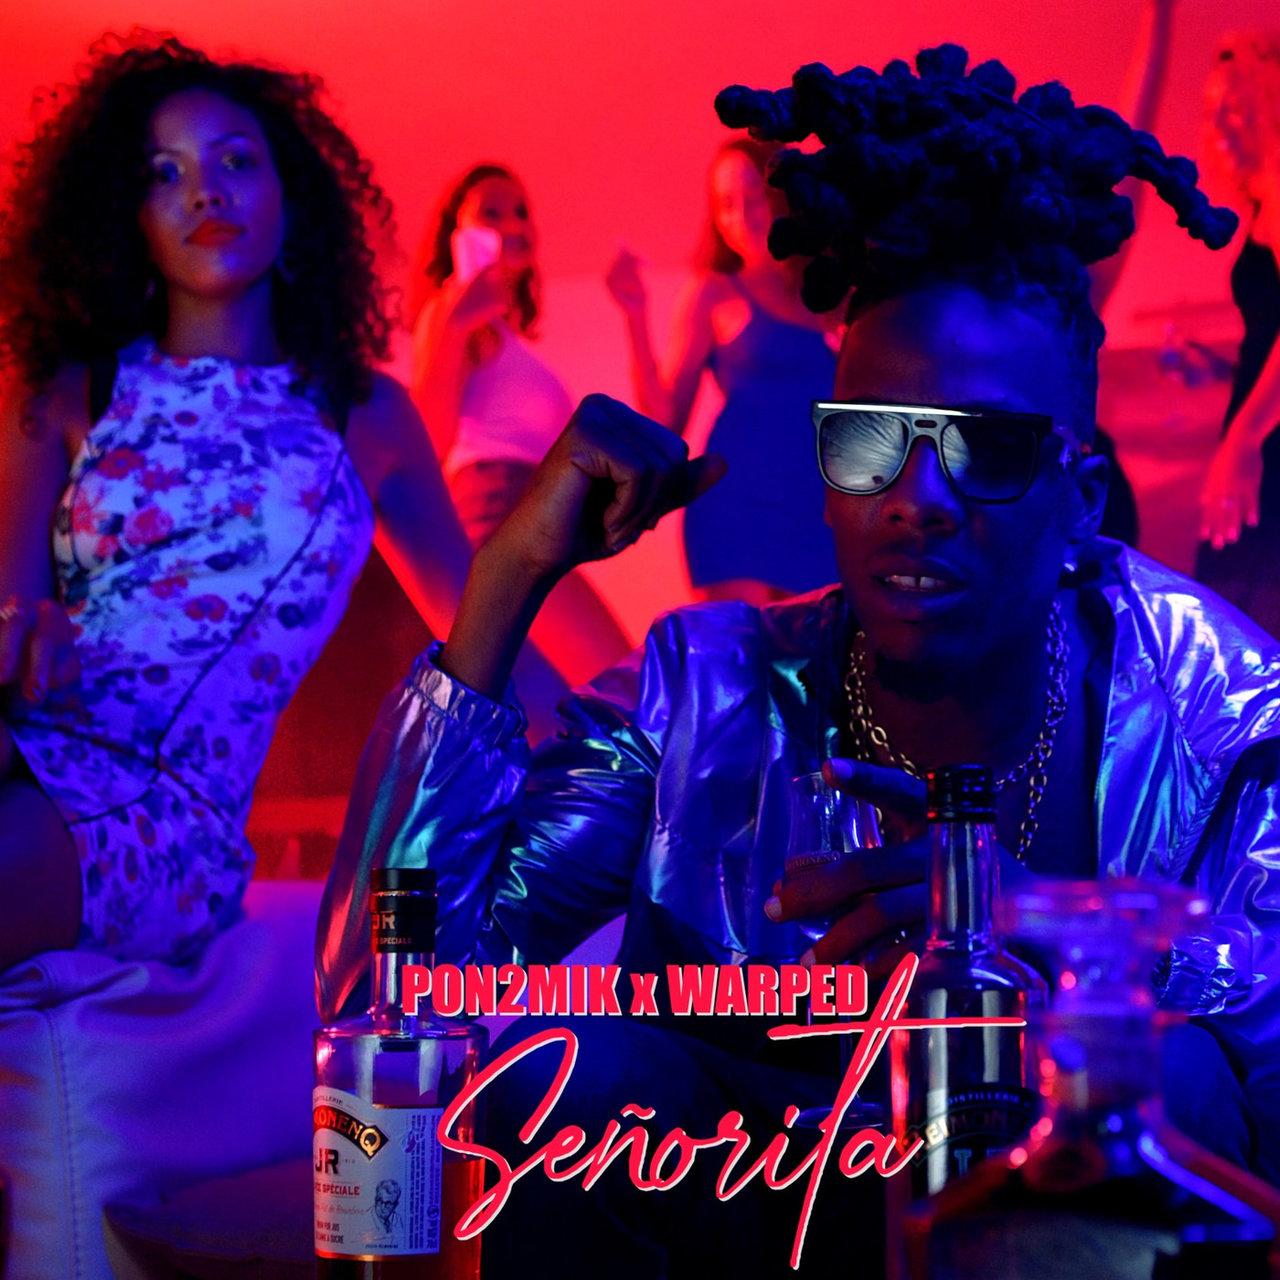 Pon2mik - Señorita (ft. Warped) (Cover)